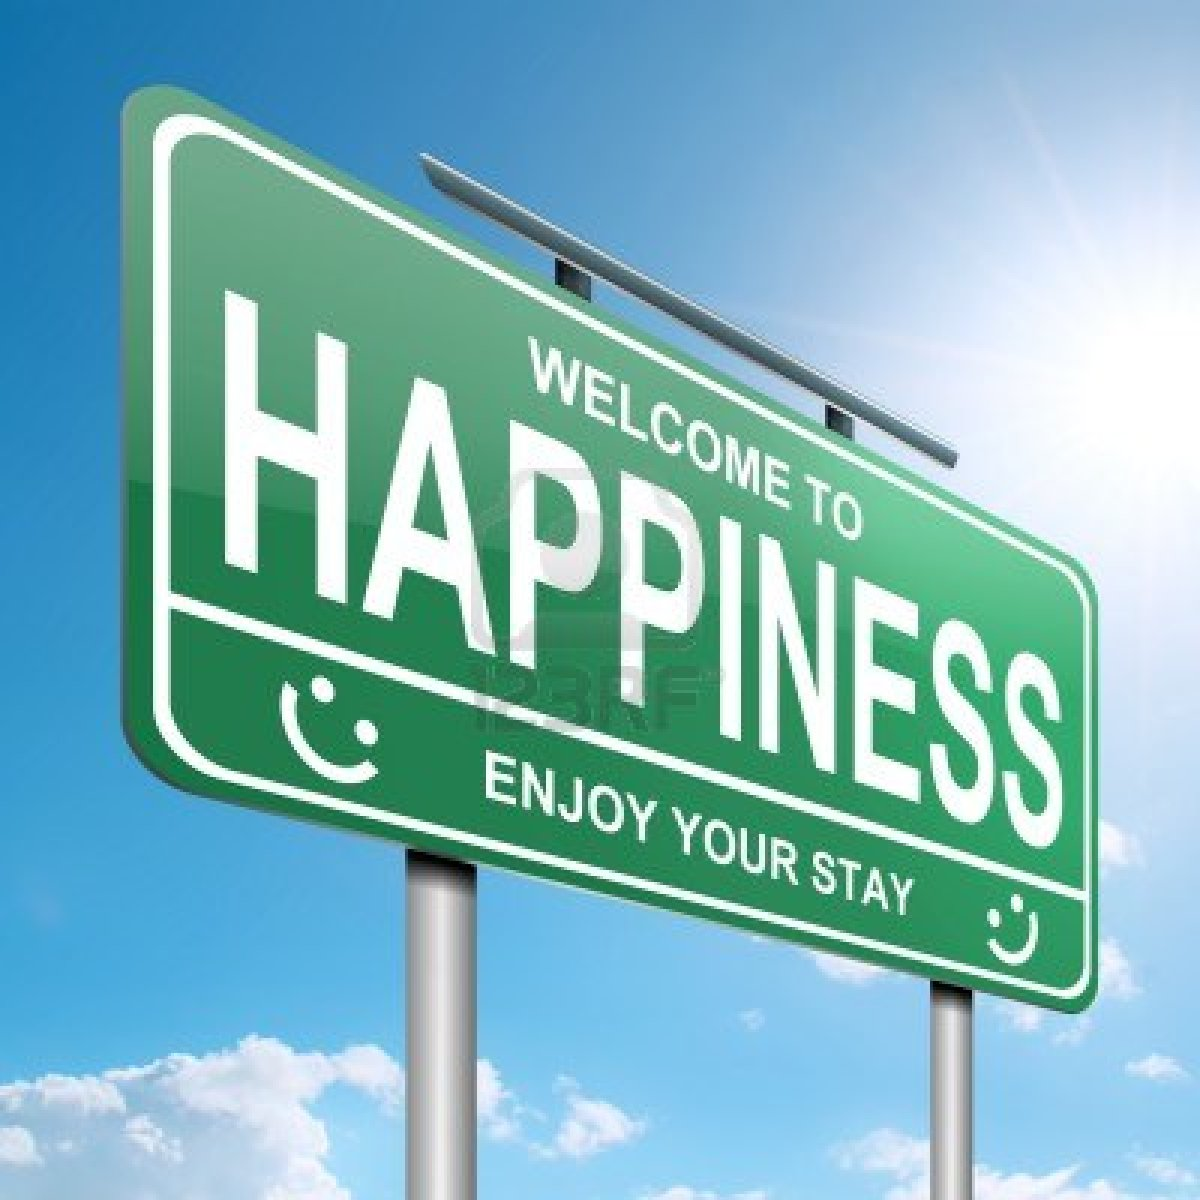 Self-development for a happy life